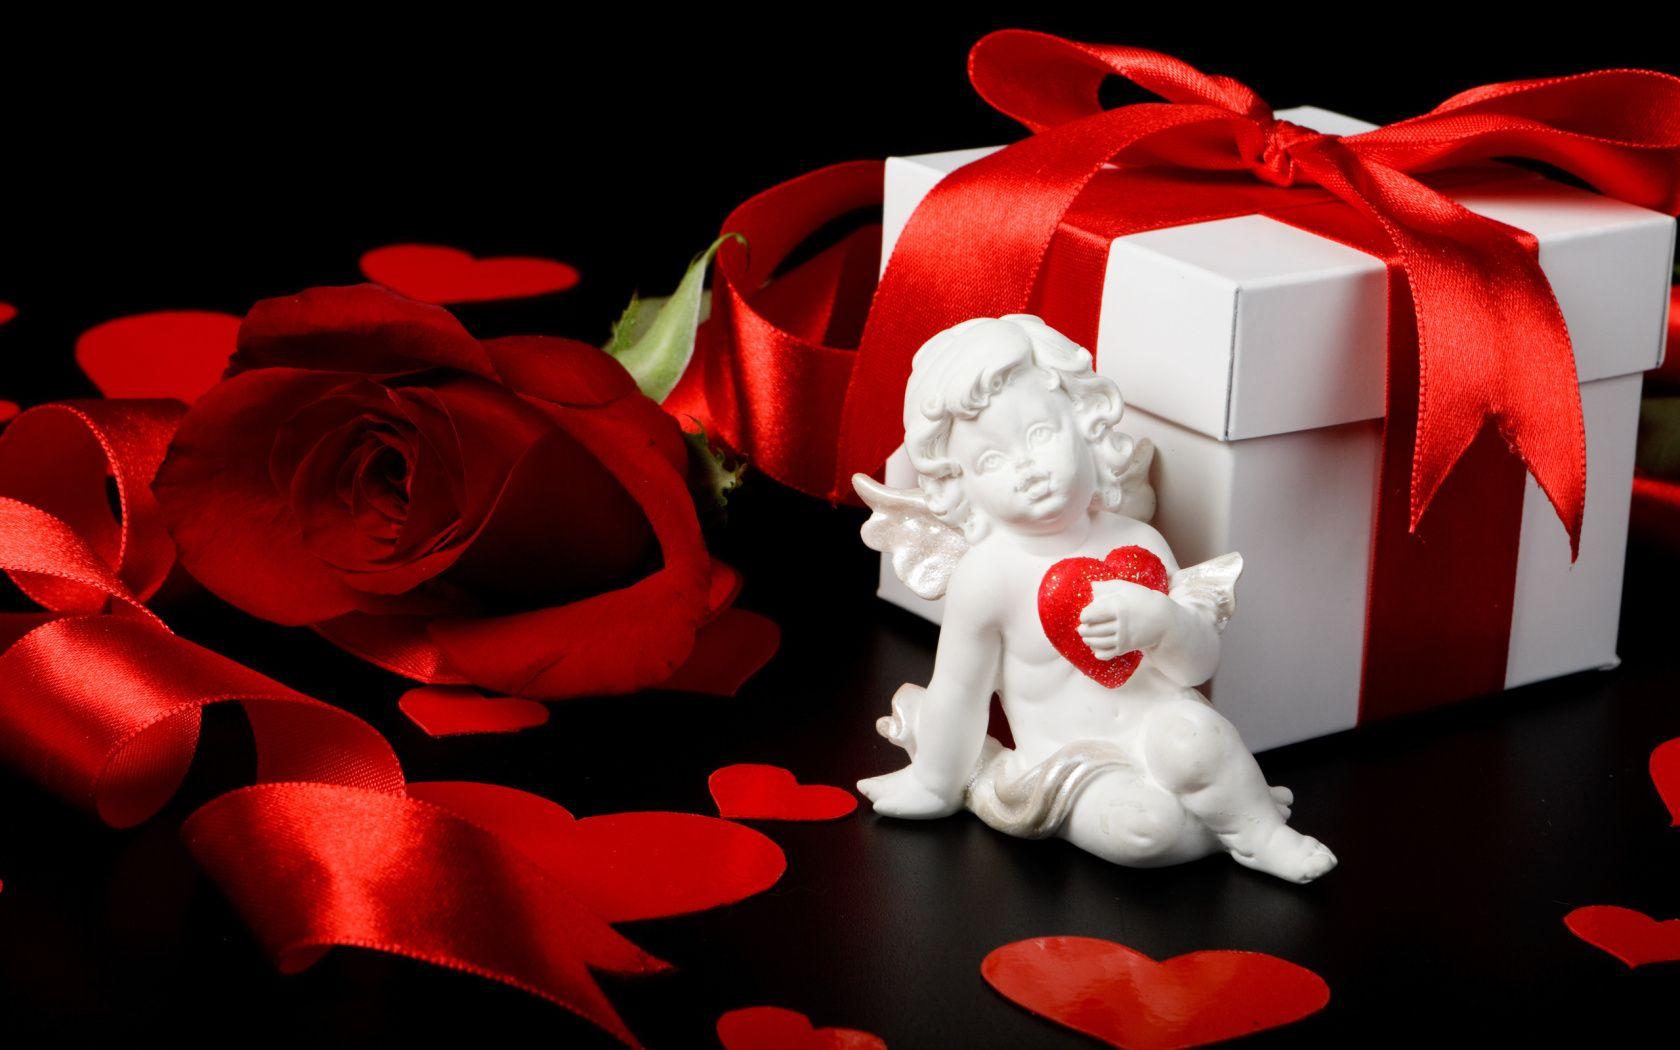 Cupids arrows hd desktop wallpaper high definition fullscreen art